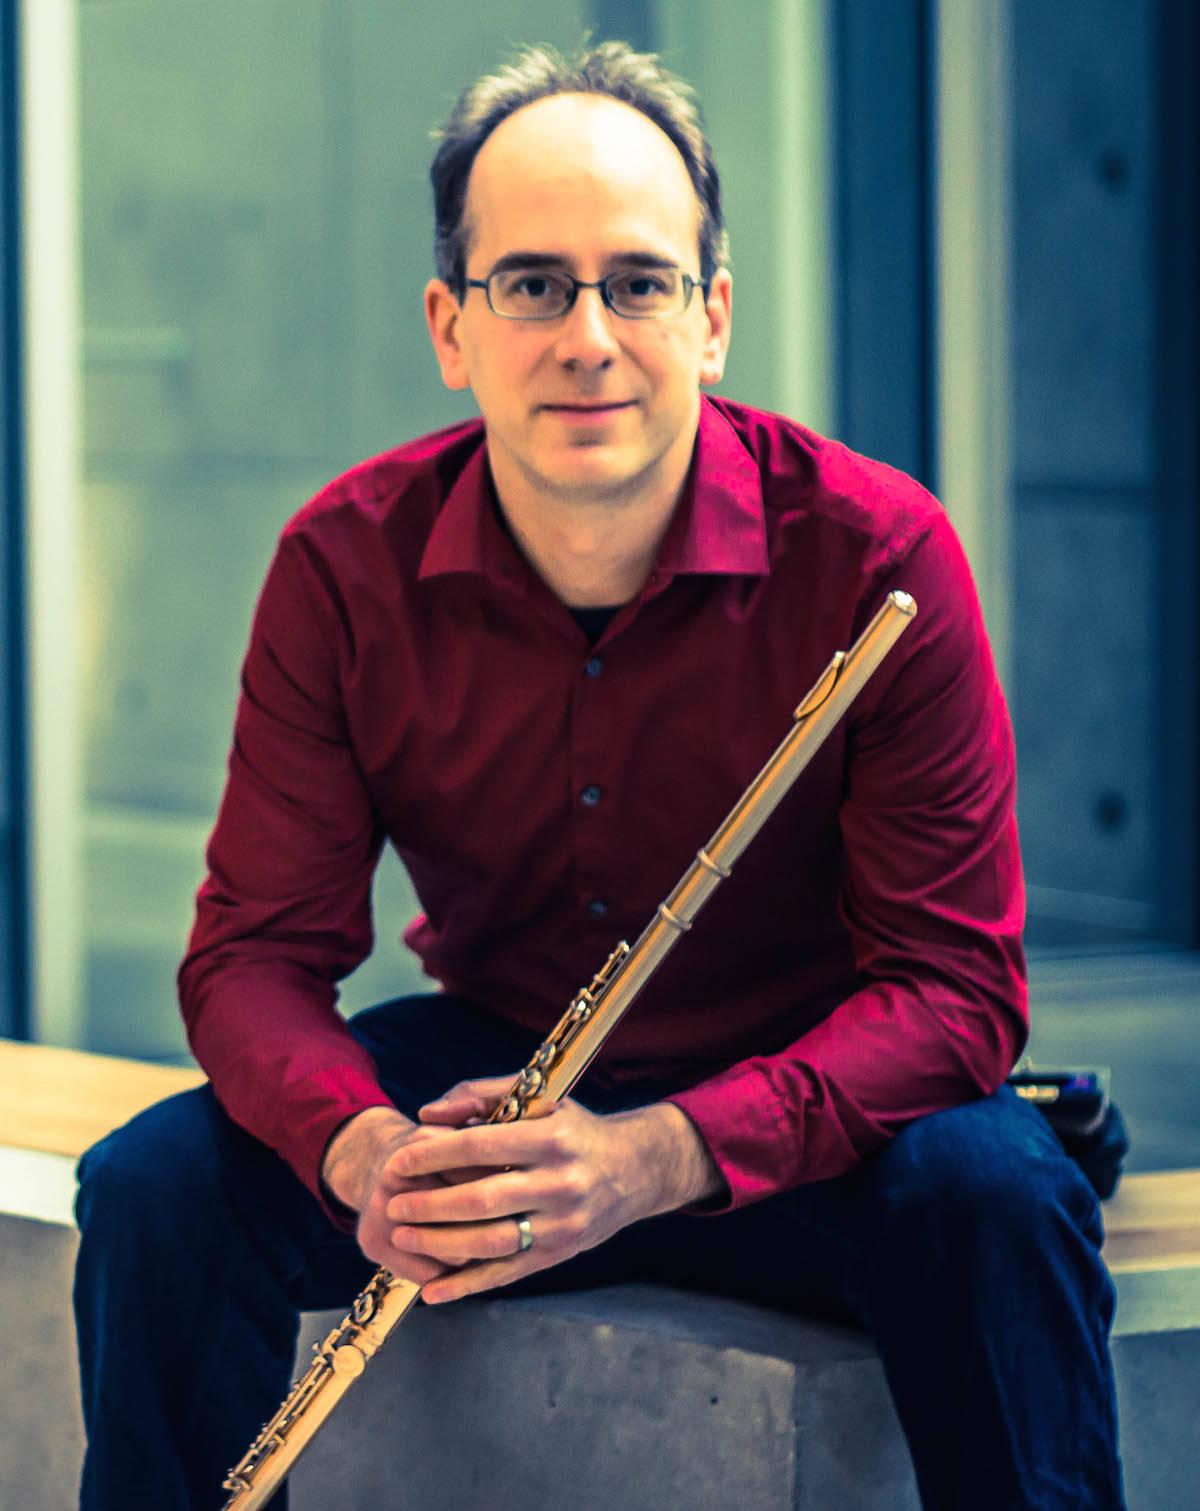 Paolo Bertolussi, flute